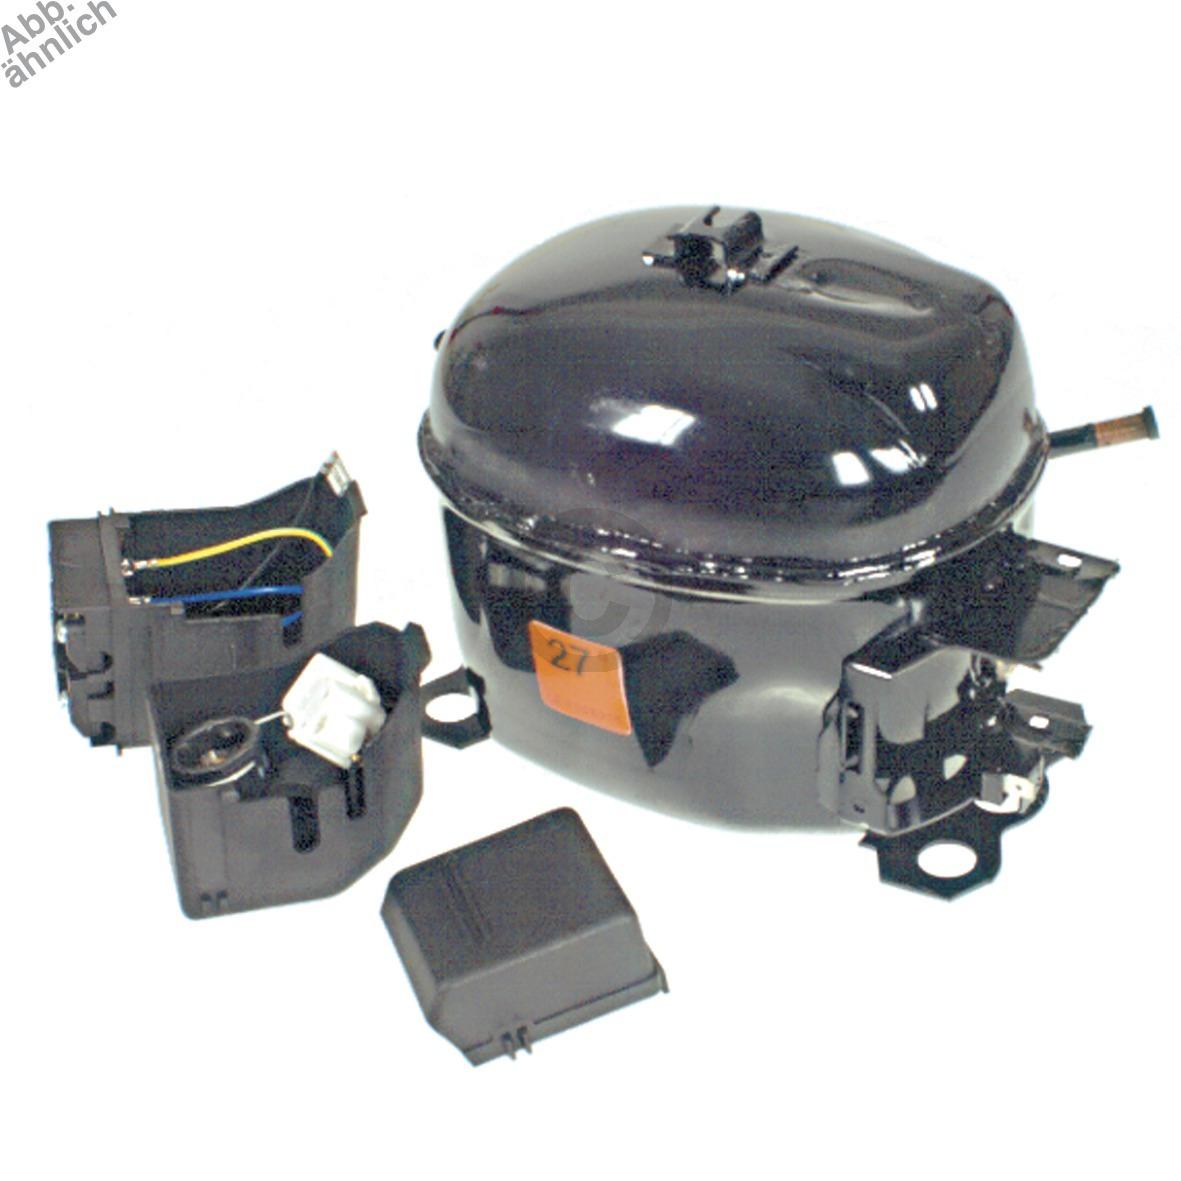 Kompressor für R600A 1/8PS 481281718831 Bauknecht, Whirlpool, Ikea, Liebherr